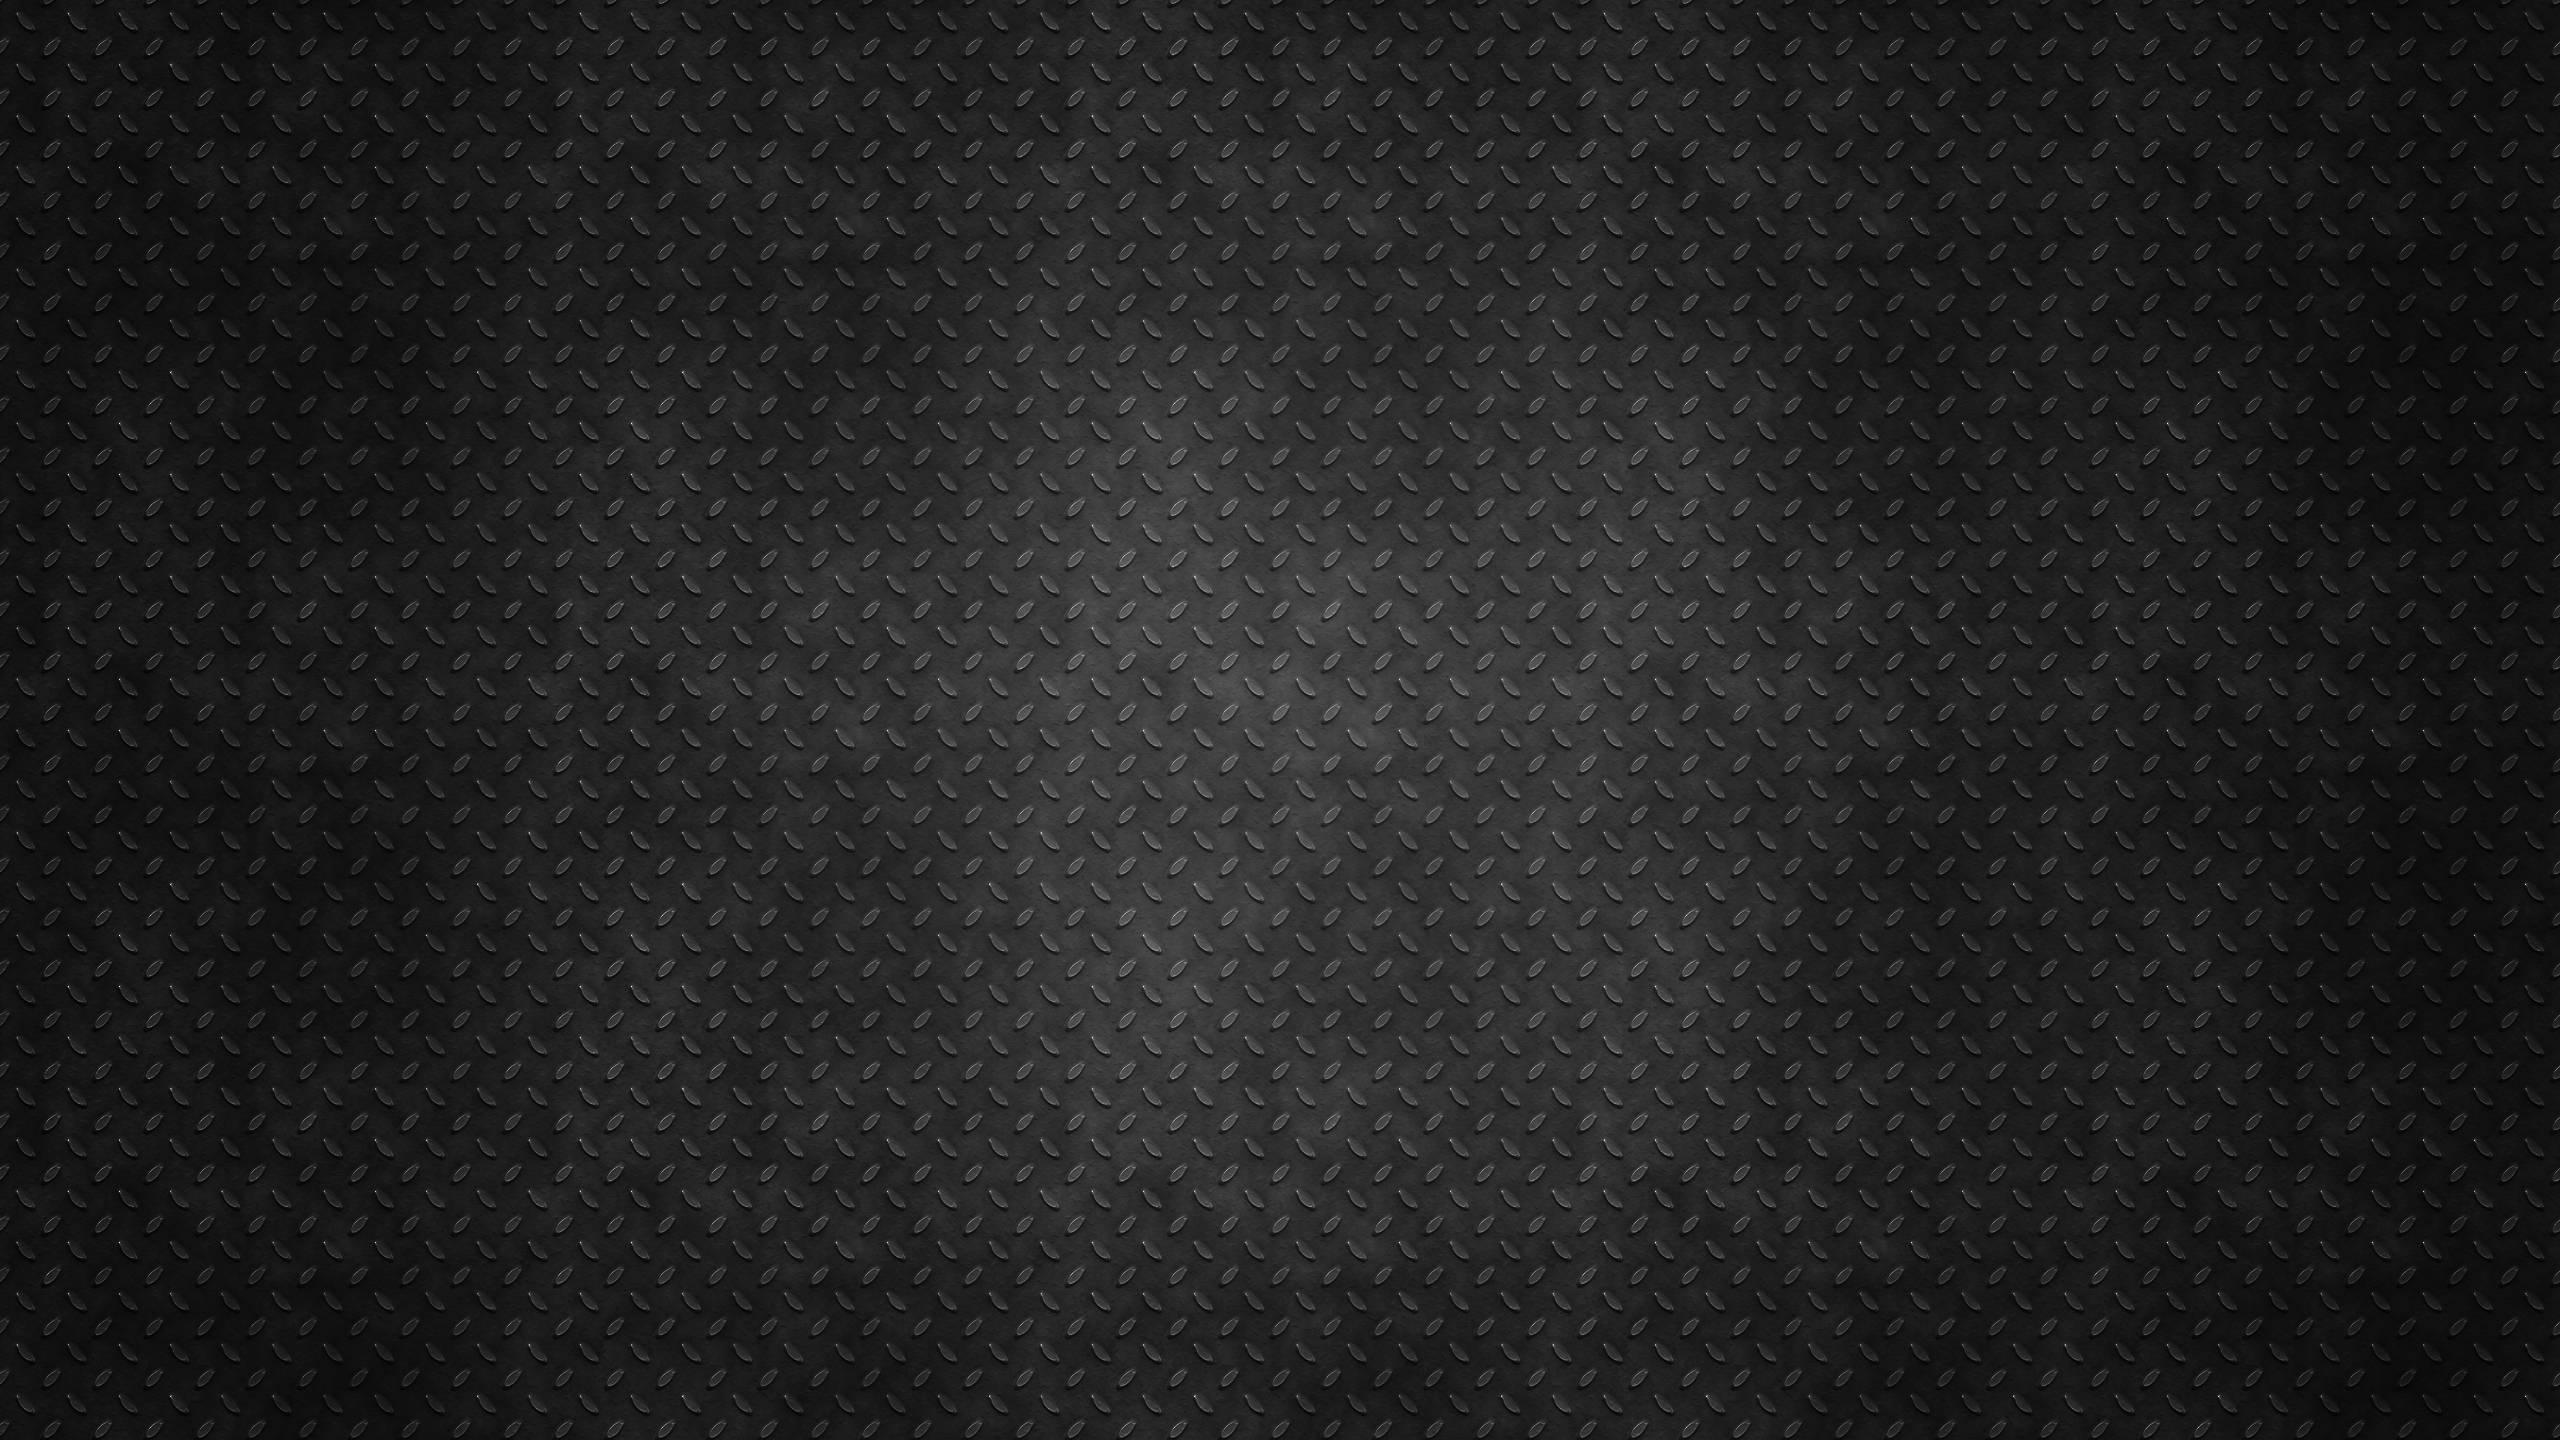 black texture wallpaper 1920x1080 - photo #18